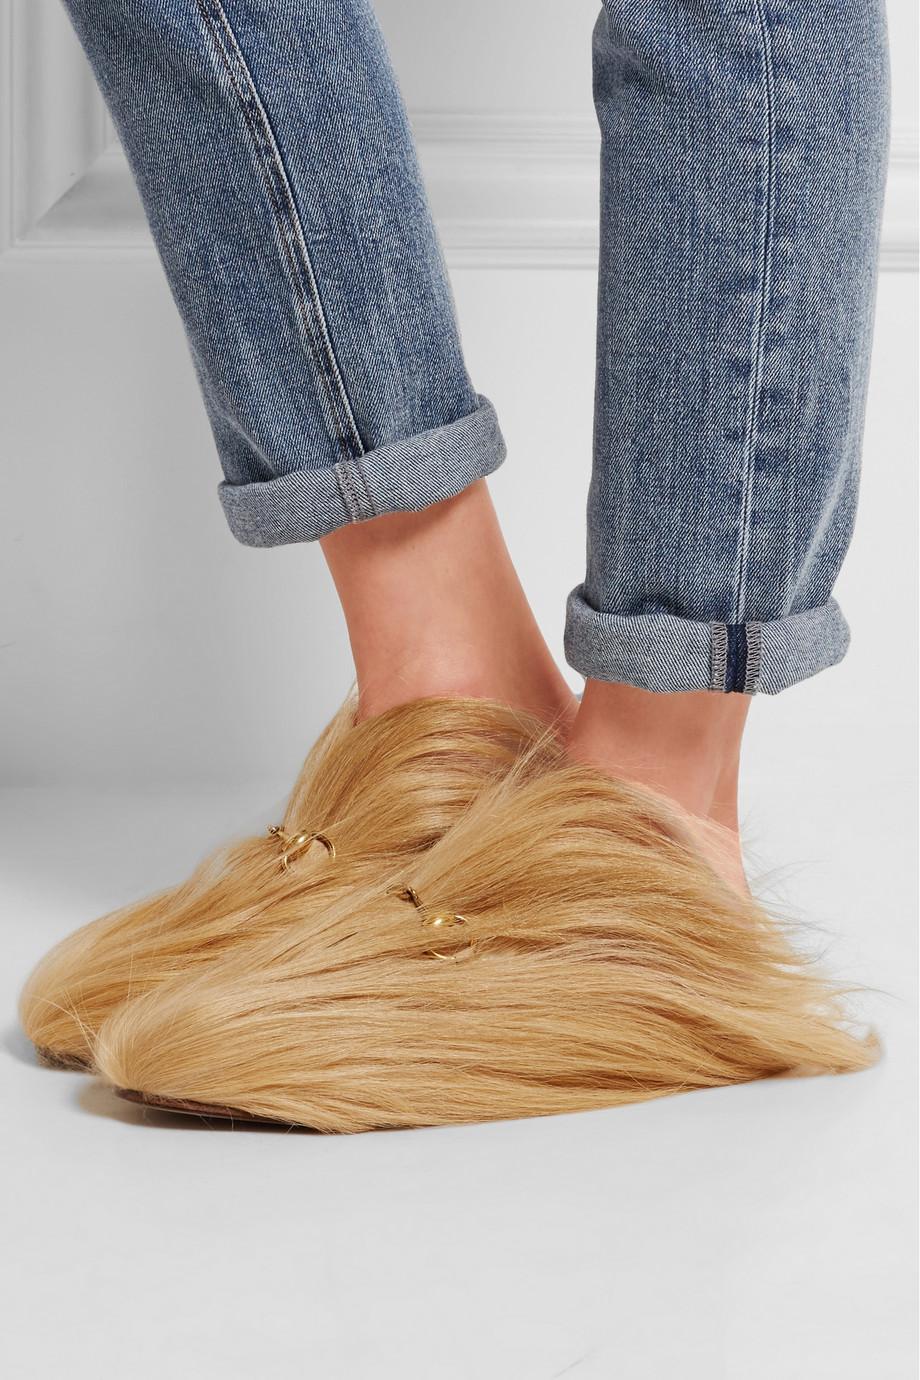 gucci goat hair slippers3.jpg